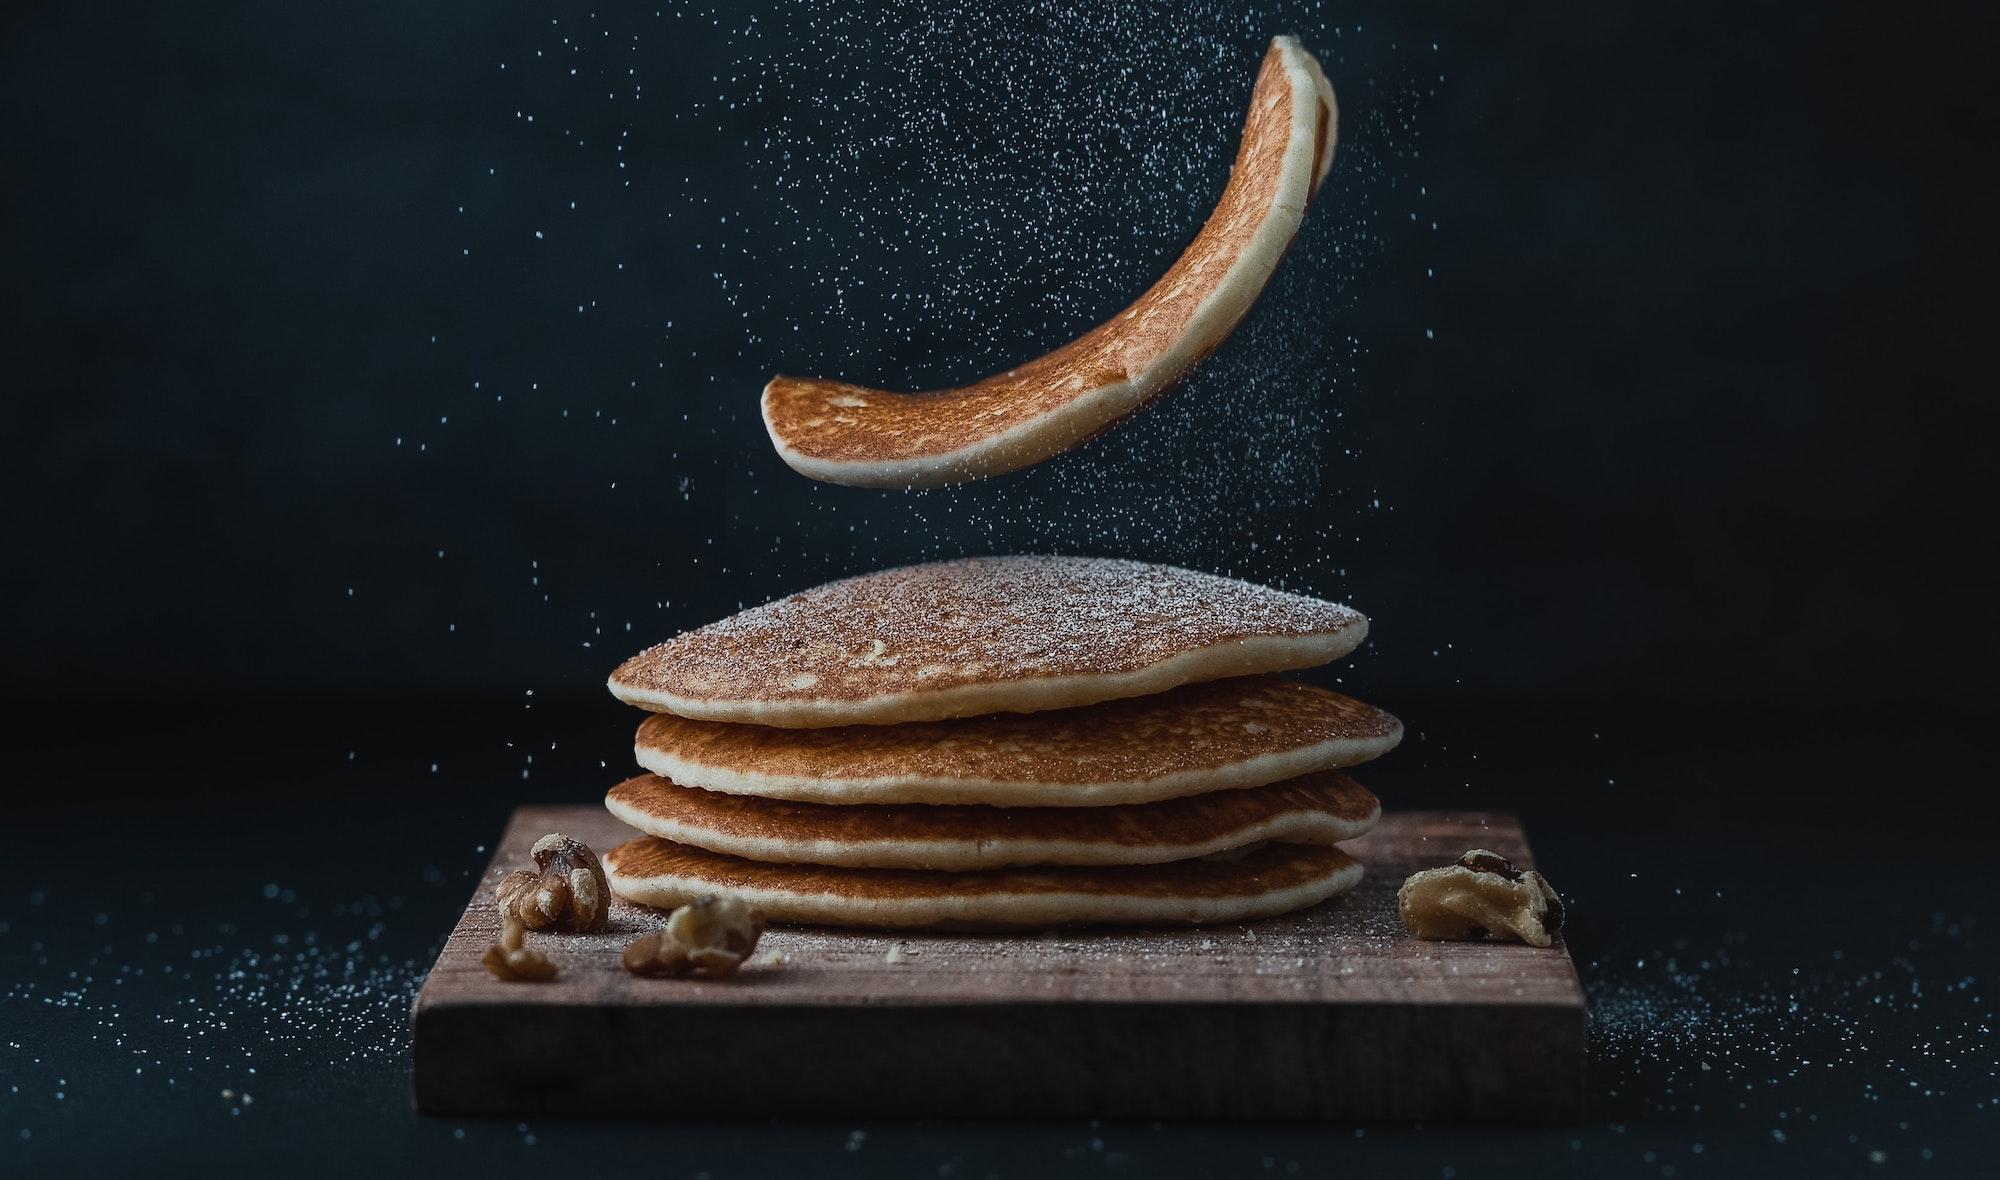 Cuinneog's Buttermilk Pancakes